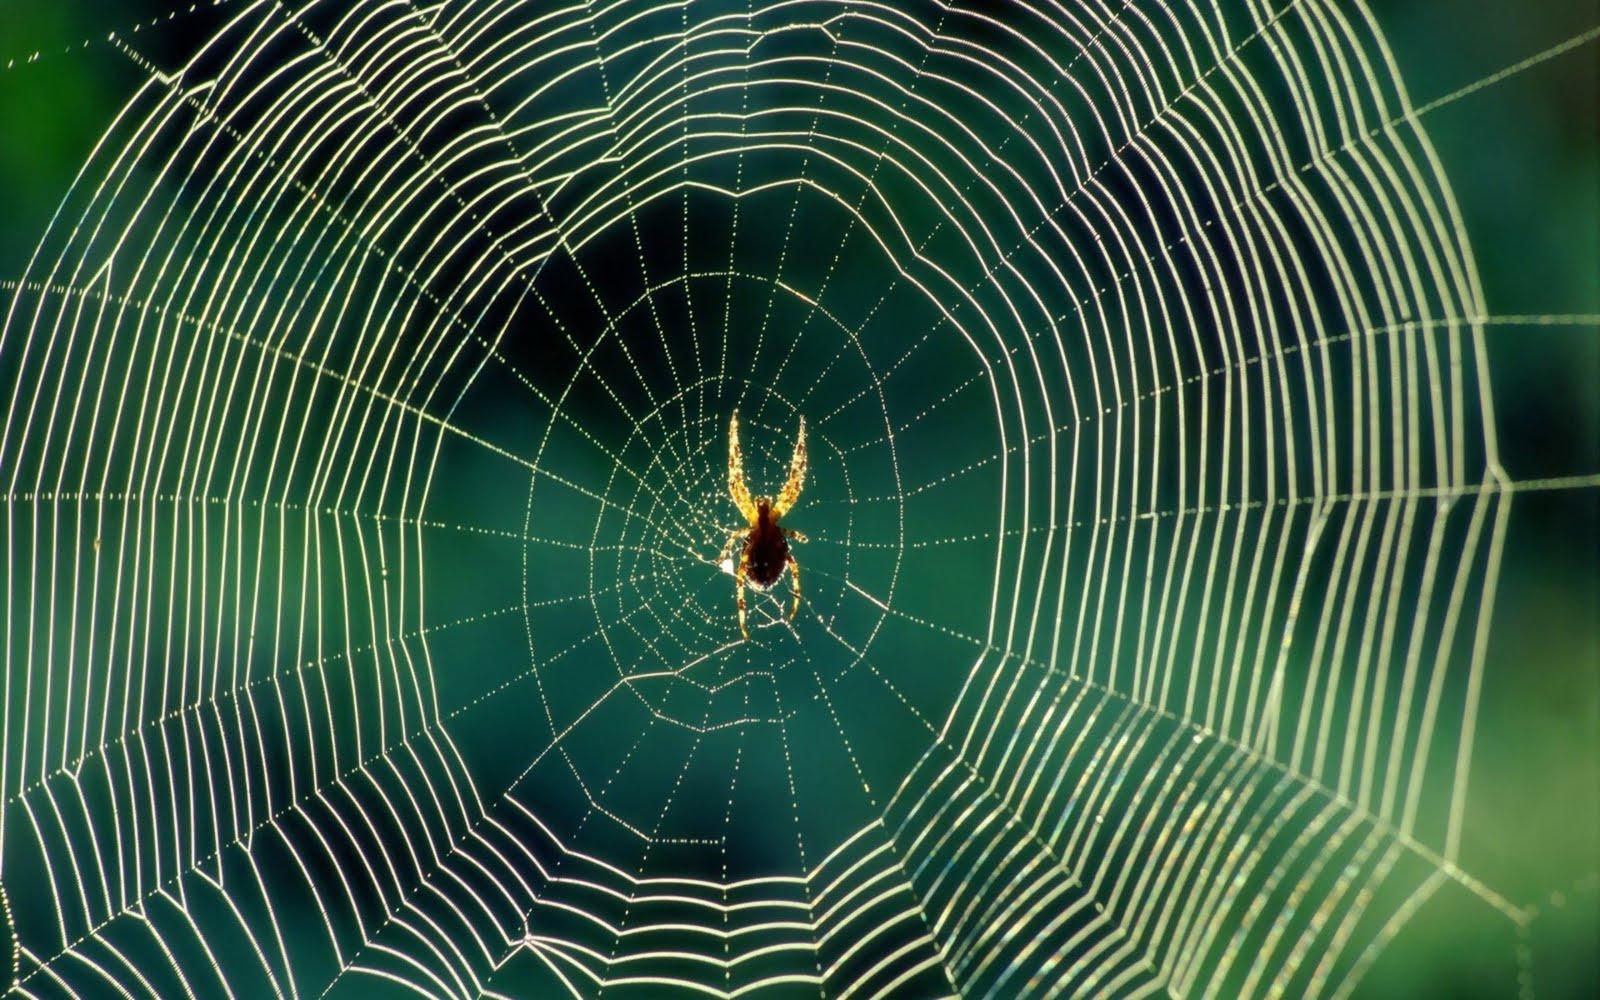 Www Hd Animal Wallpaper Com Spinnen Achtergronden Hd Wallpapers